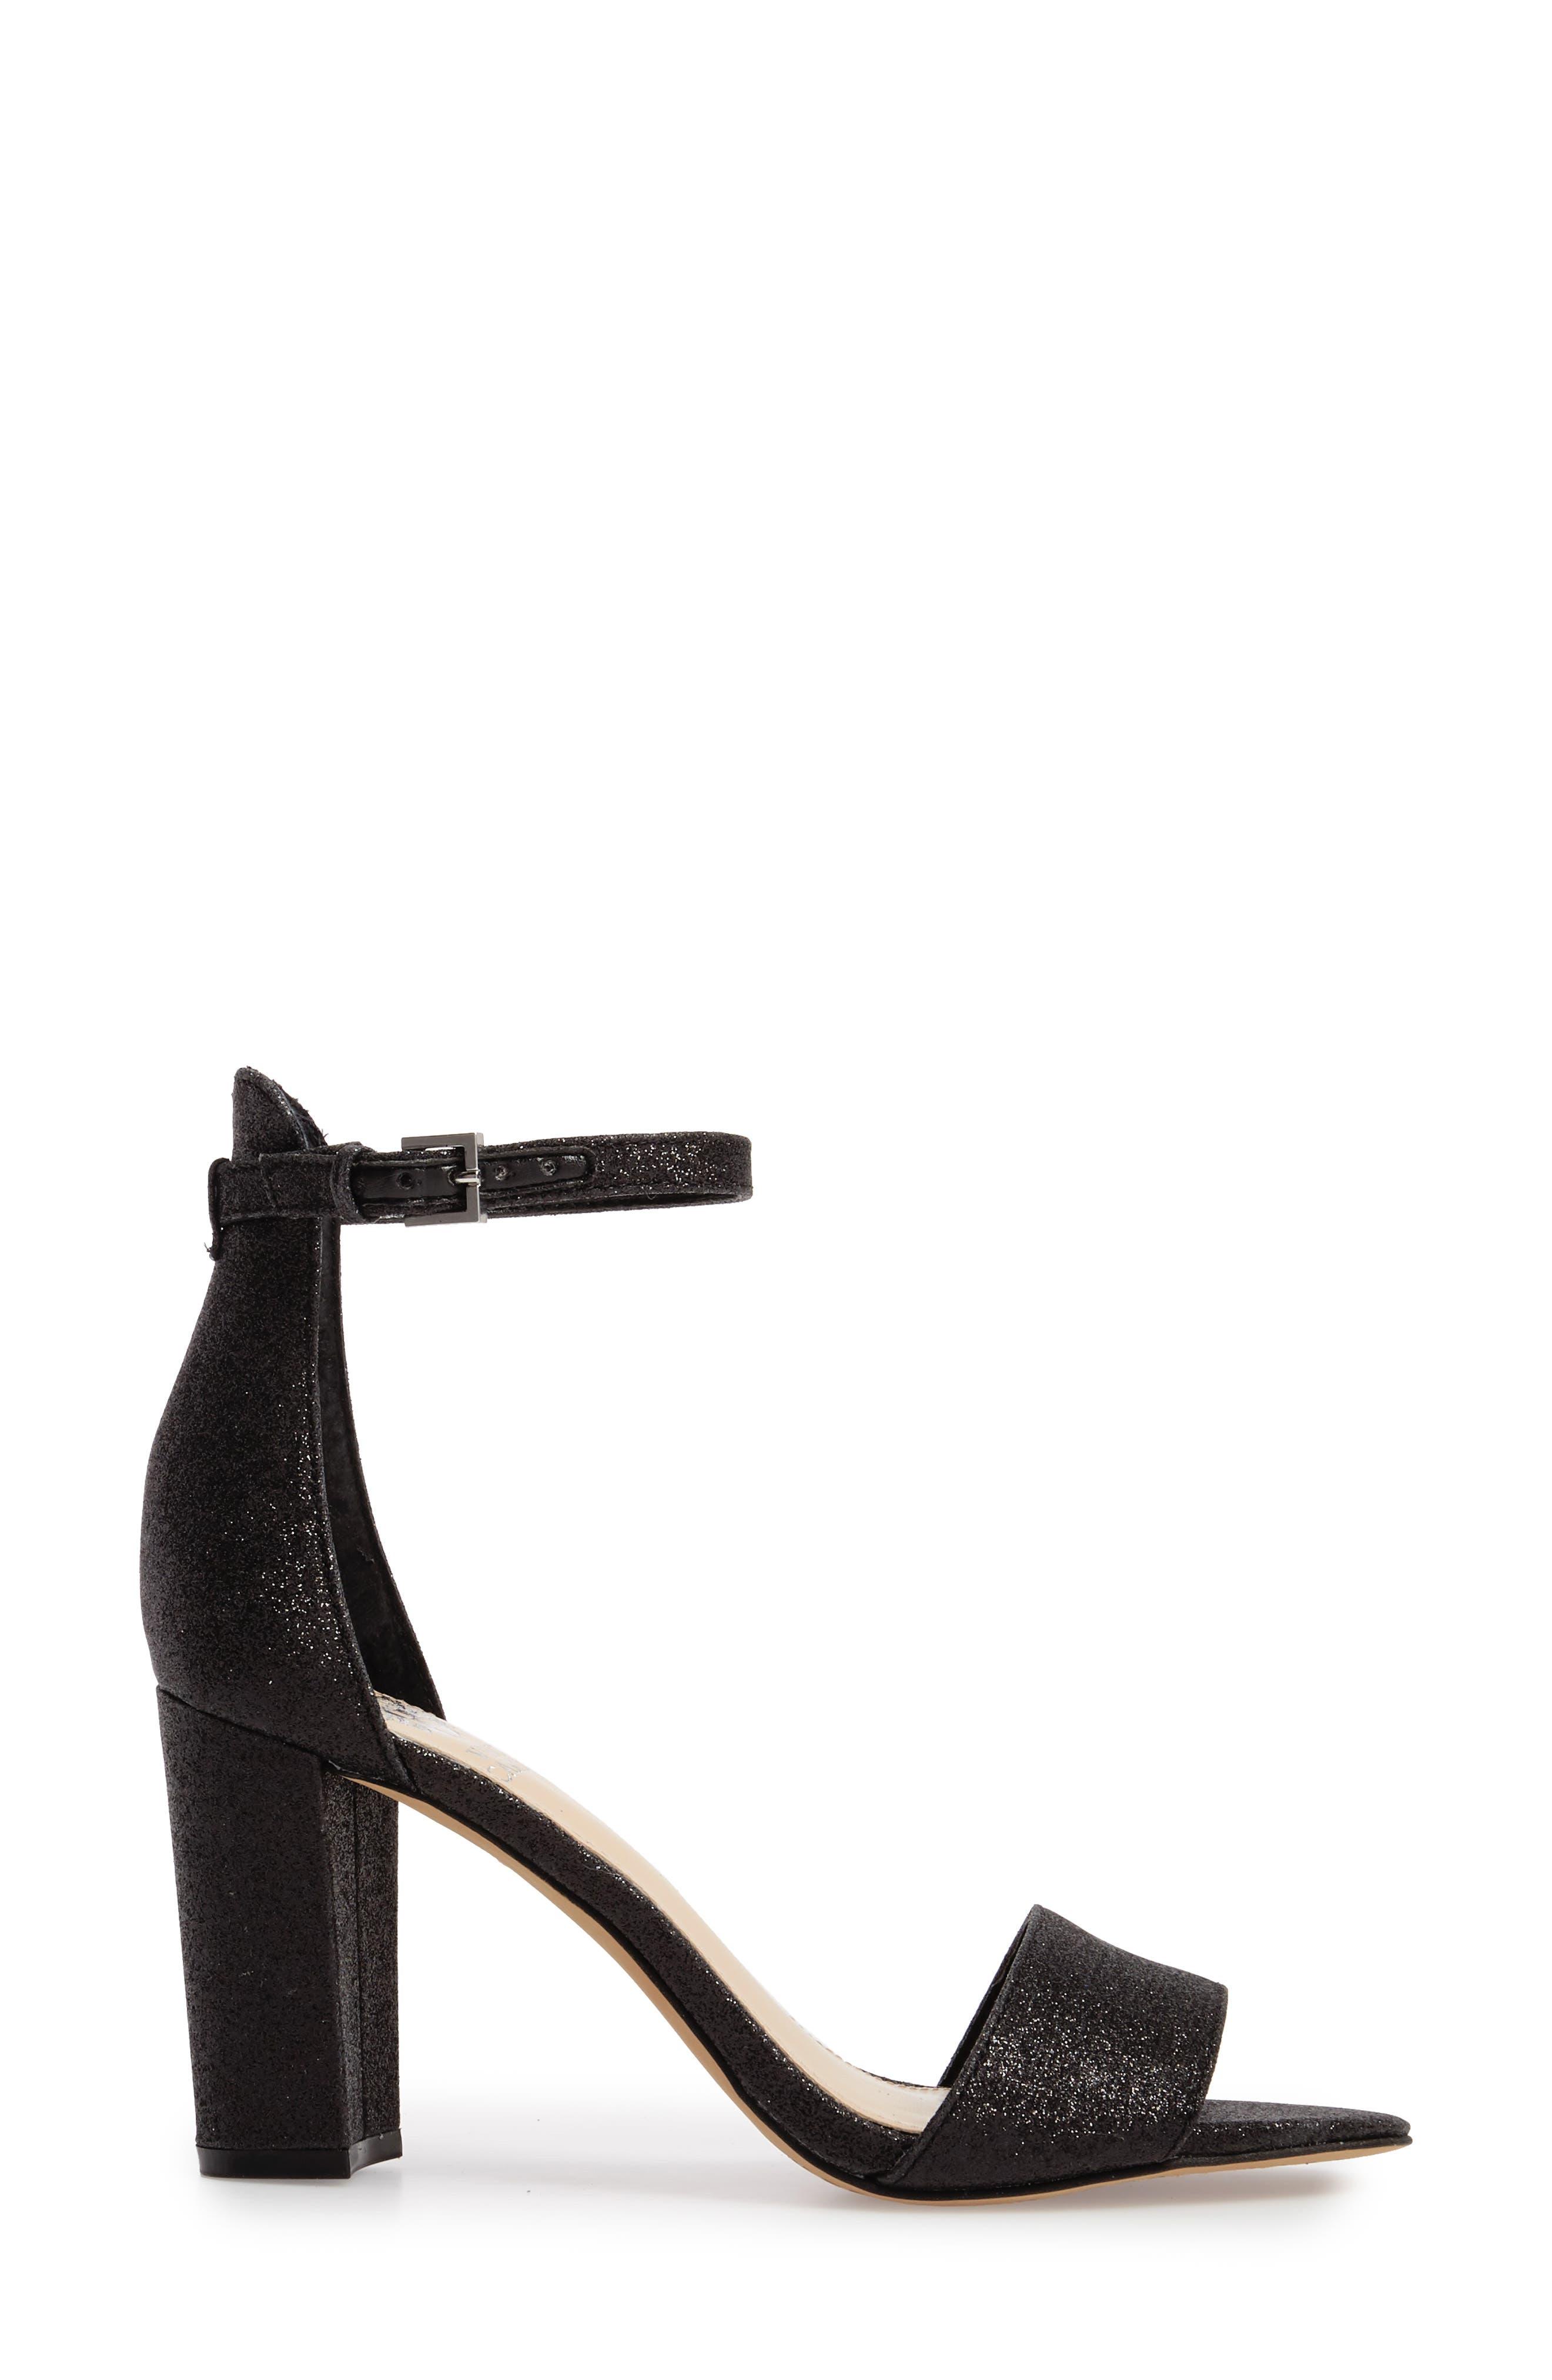 Corlina Ankle Strap Sandal,                             Alternate thumbnail 3, color,                             Black Glitter Fabric